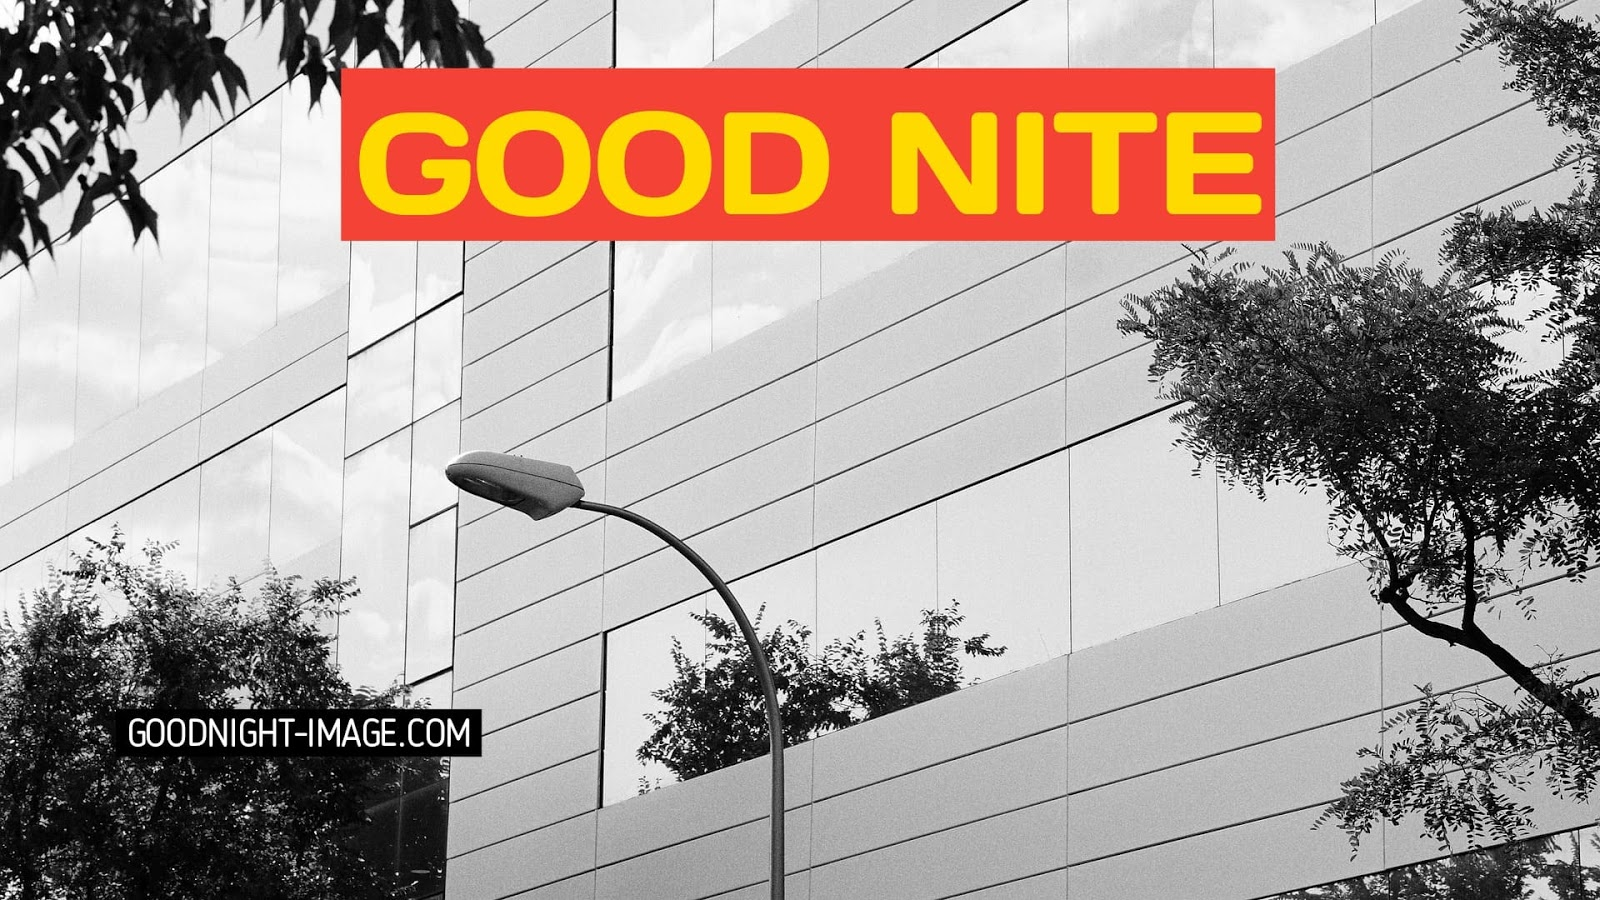 111 Goodnight Cute Images Good Nite Image Good Night Image